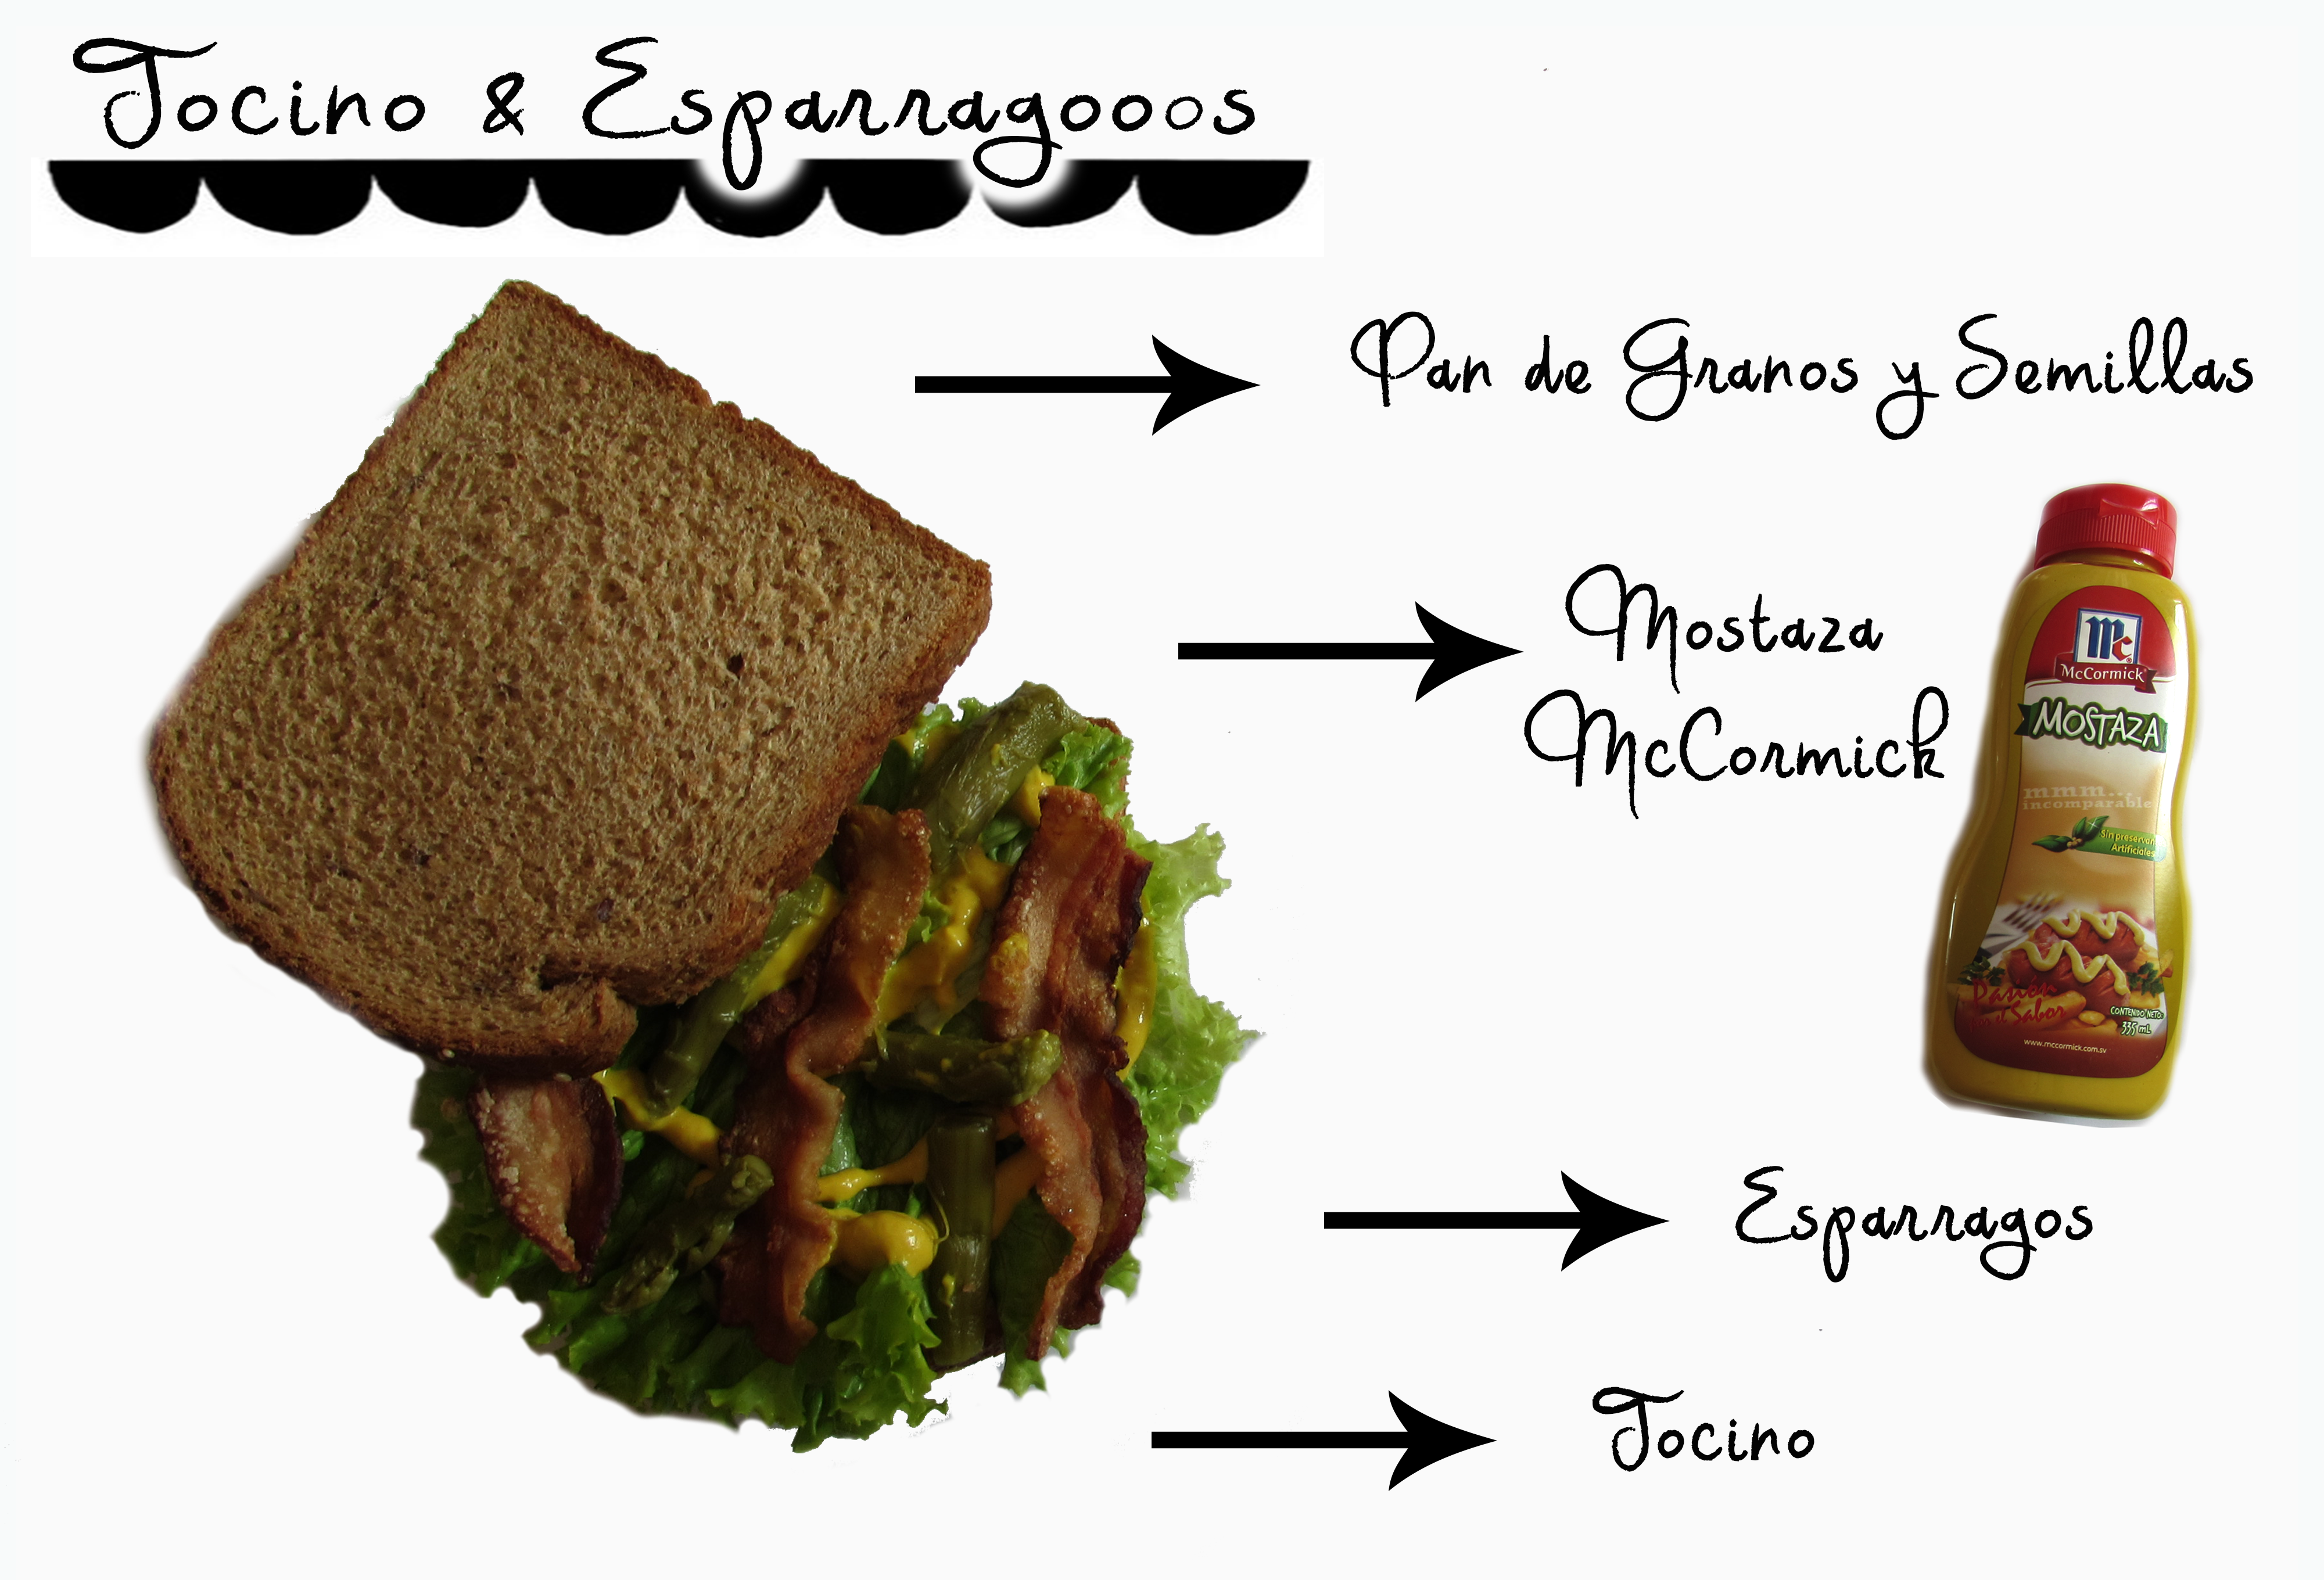 ¡Inventémonos Sandwiches!